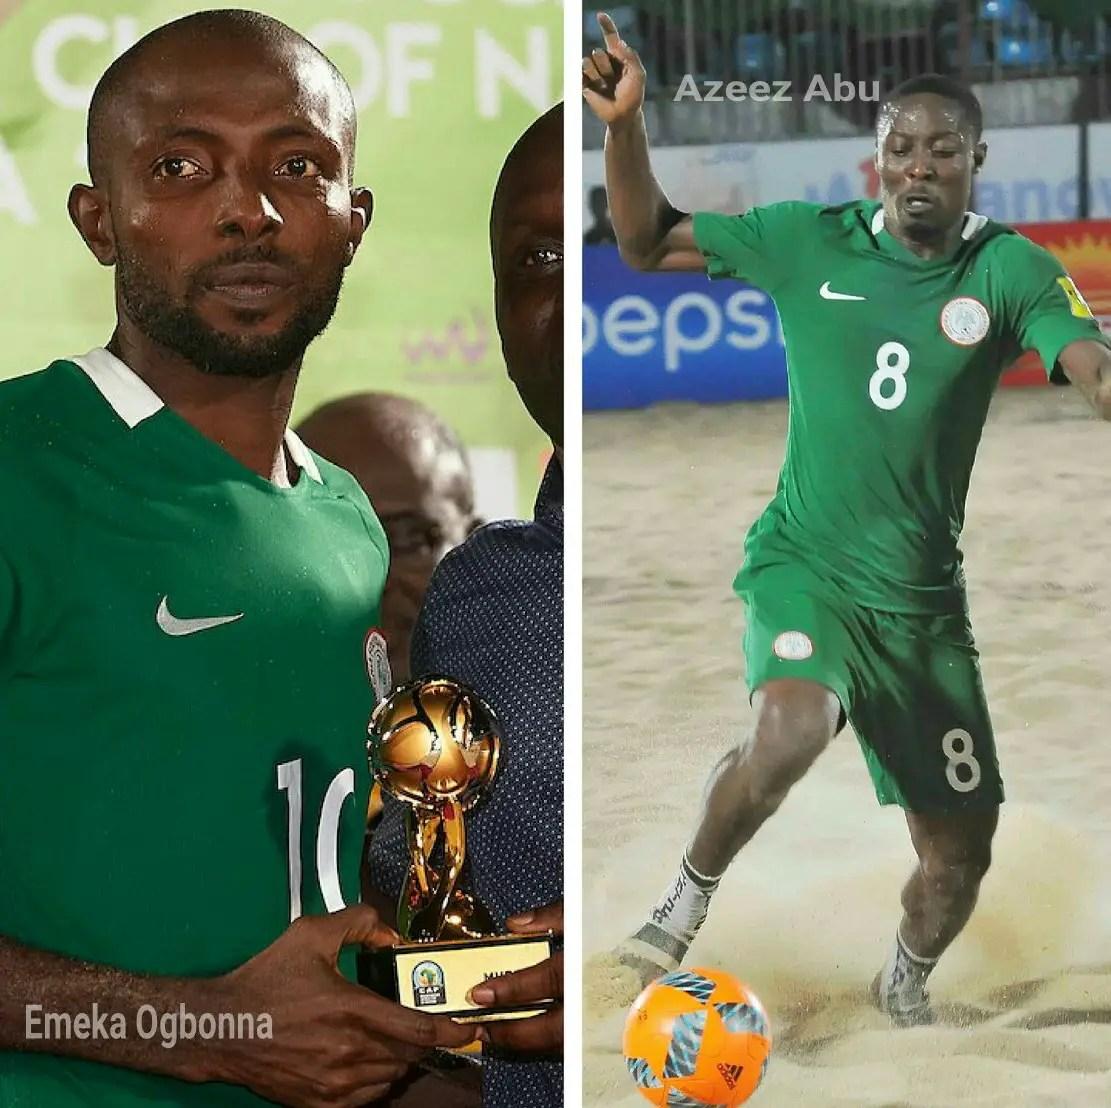 Beach Soccer AFCON: Ogbonna, Abu Lament Sand Eagles' Title Miss